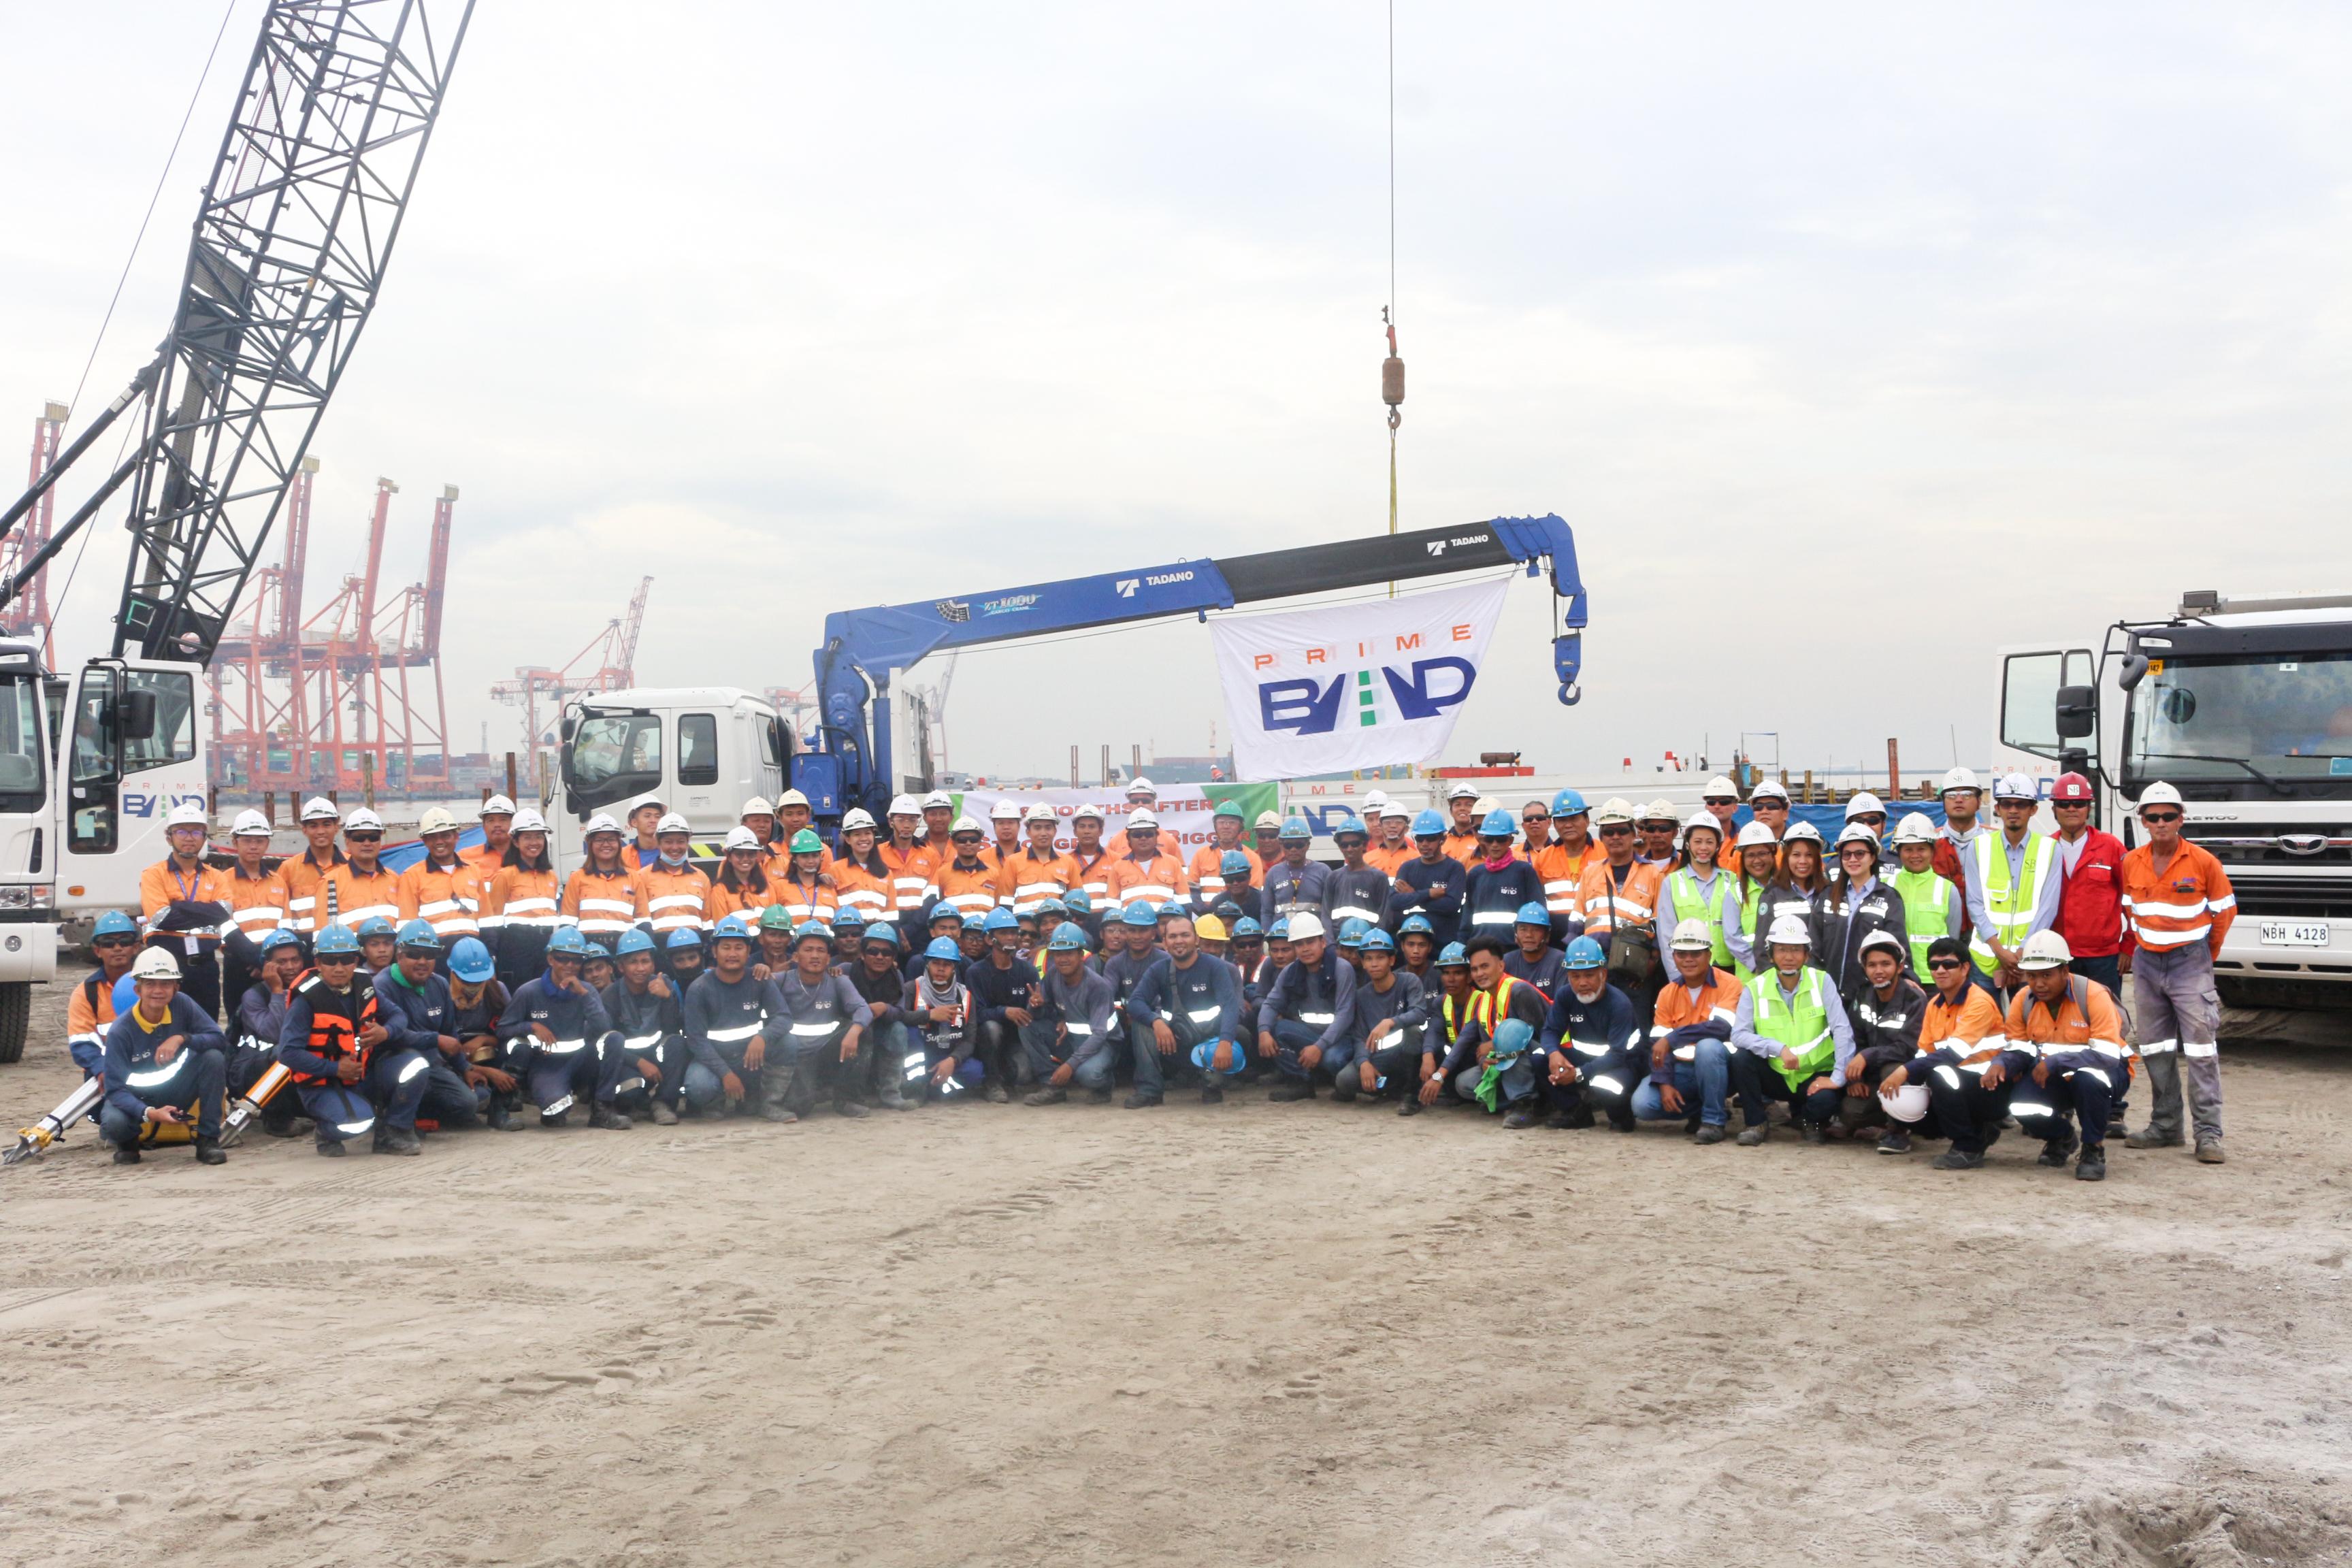 PrimeBMD holds blessing ceremony for heavy equipment